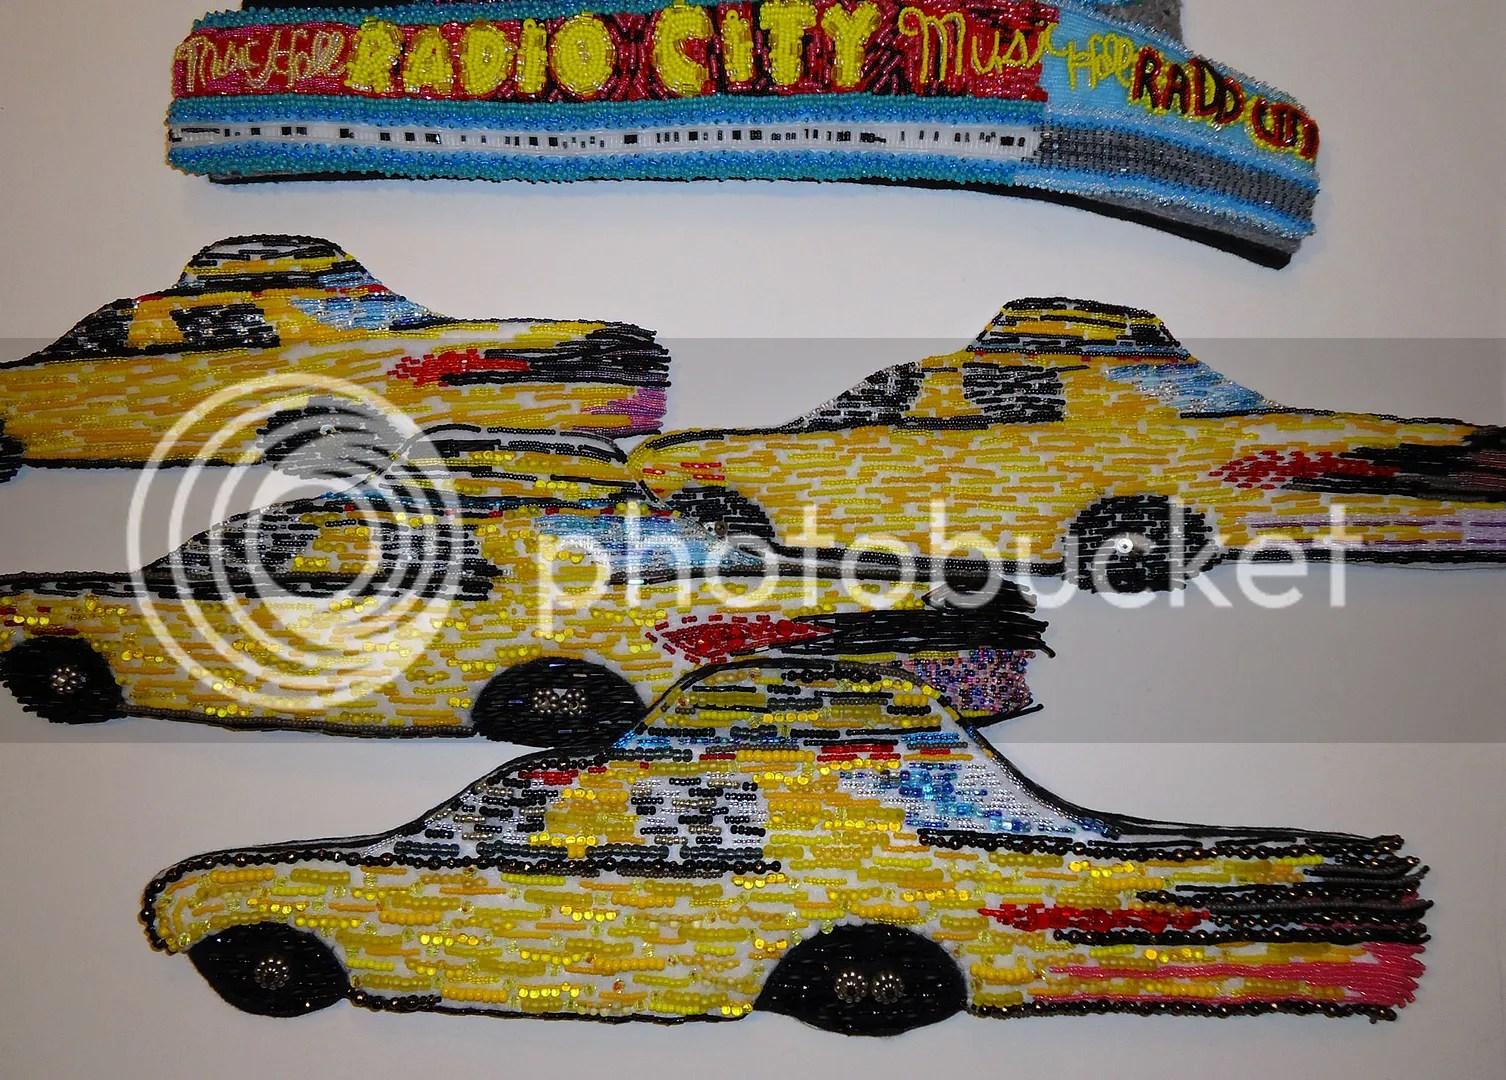 Beaded Yellow NYC taxi cab fiber art New York City mixed media painting